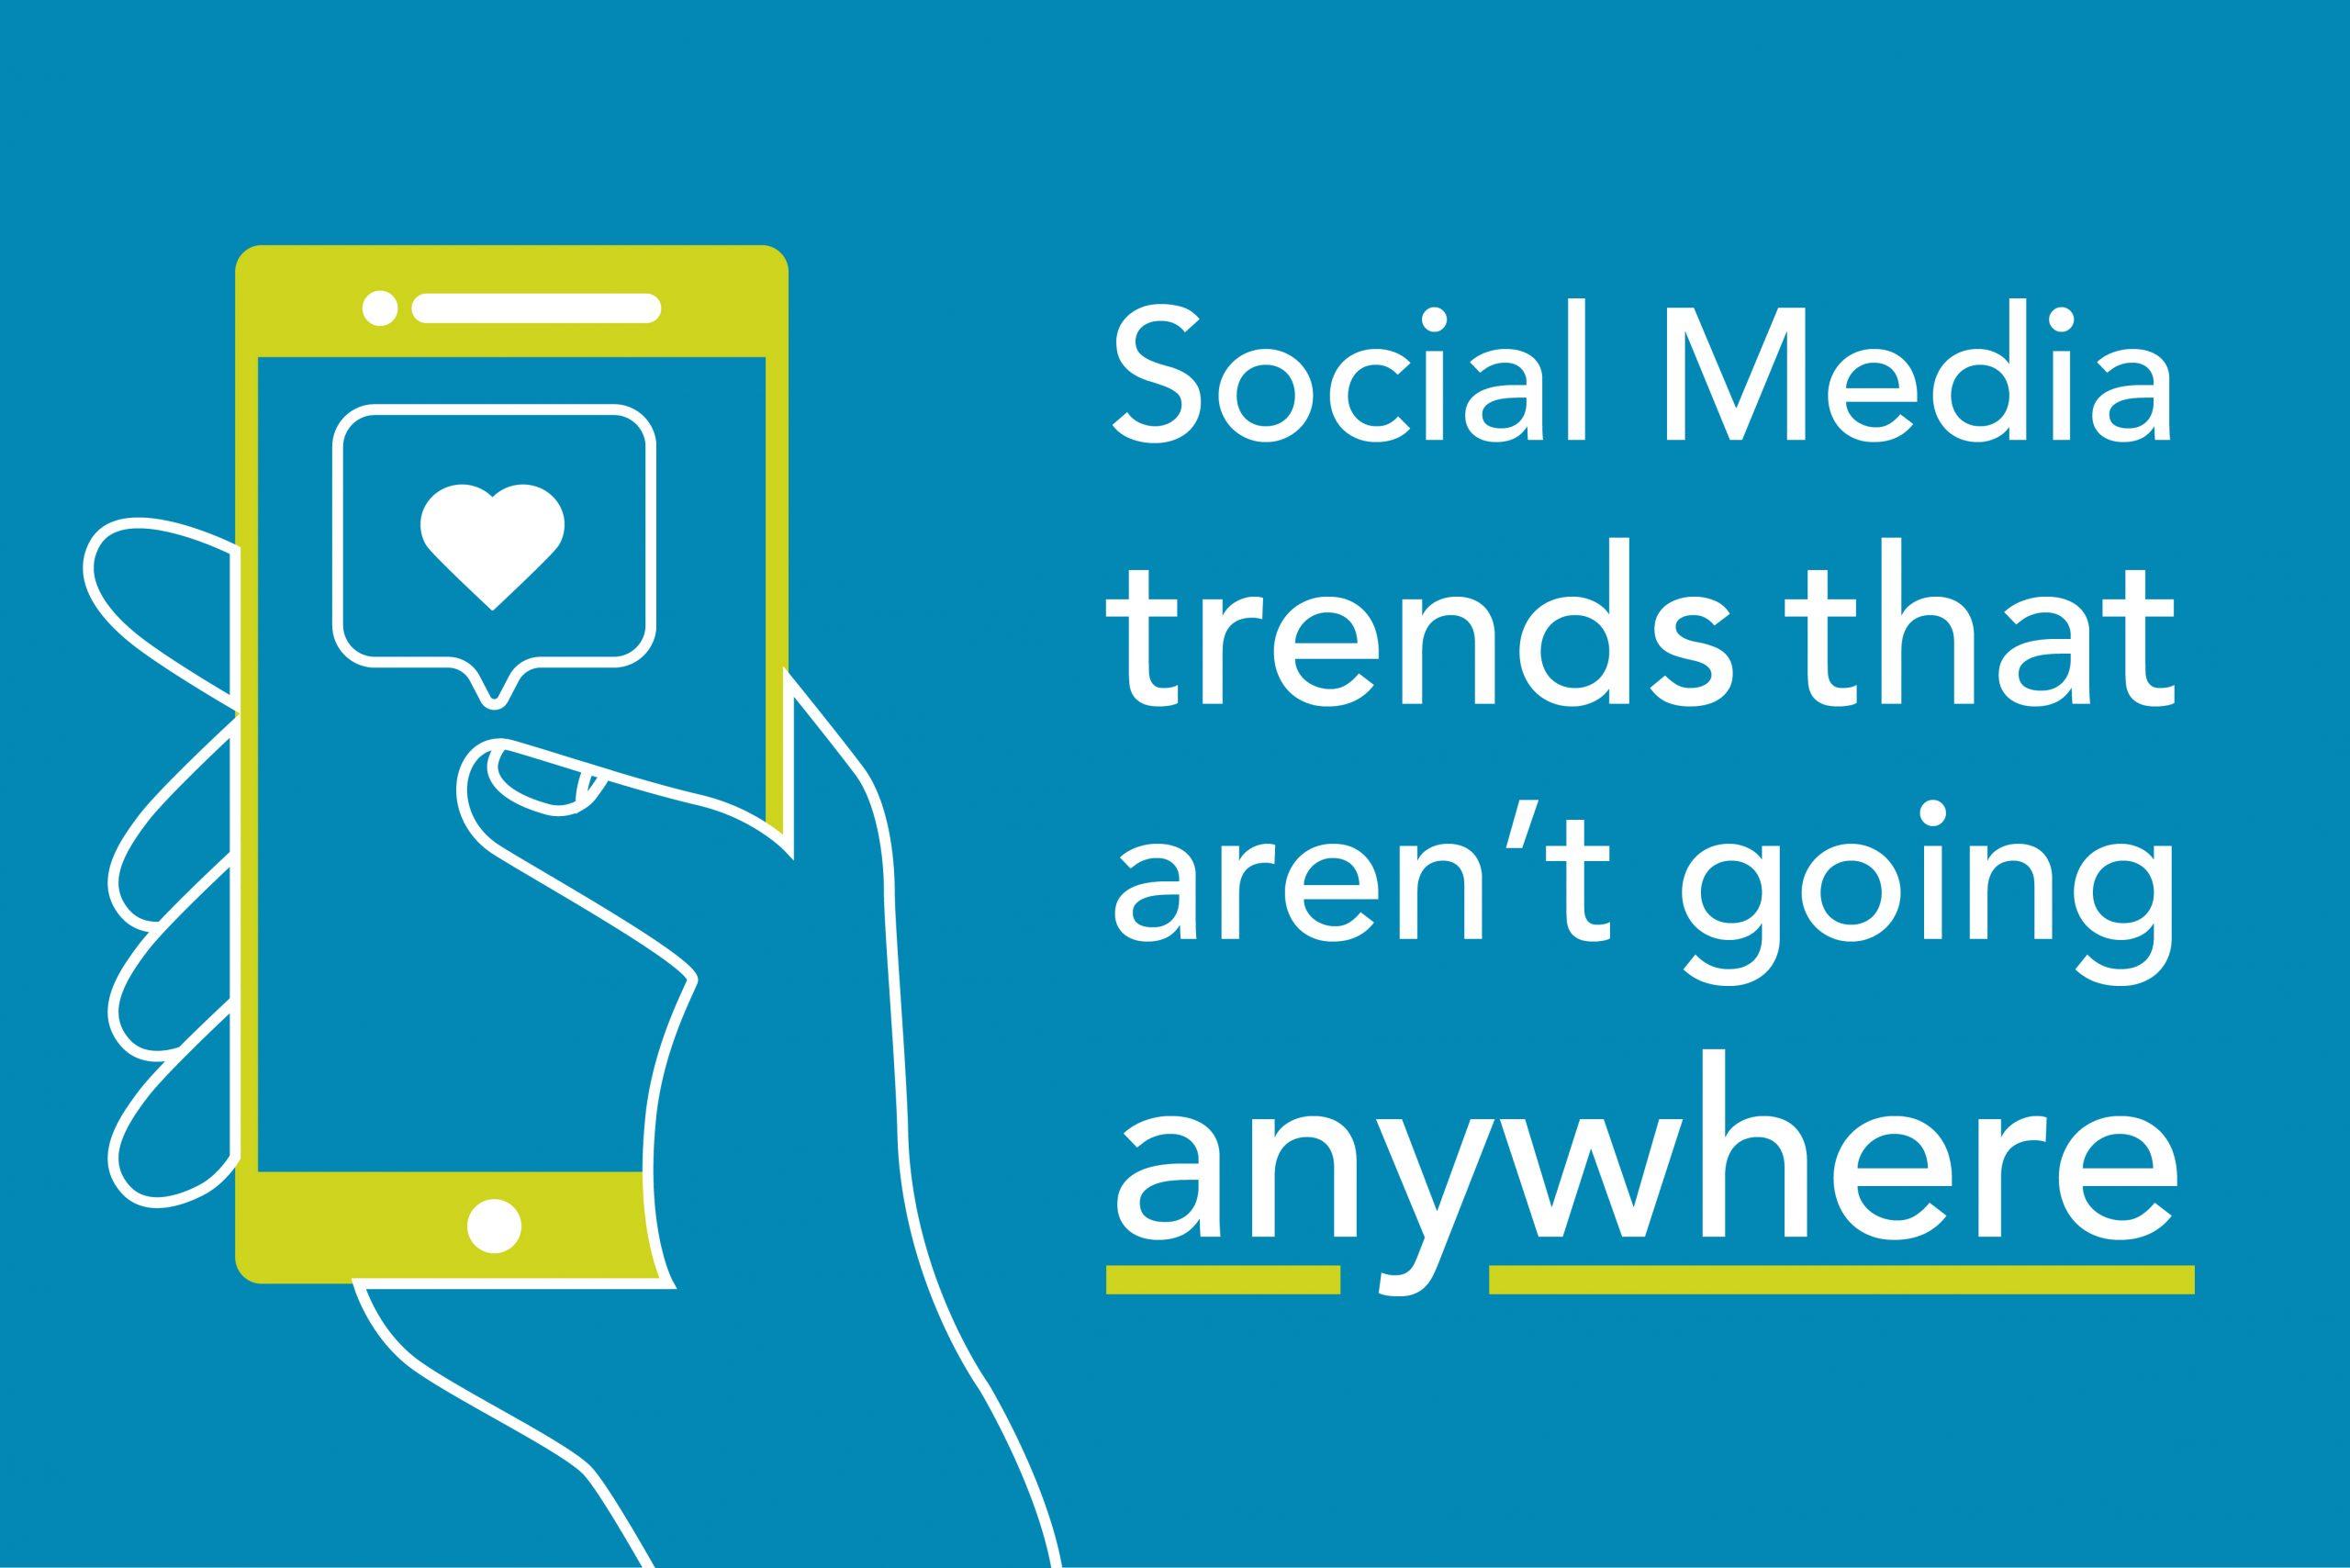 Social Media Trends That Aren't Going Anywhere